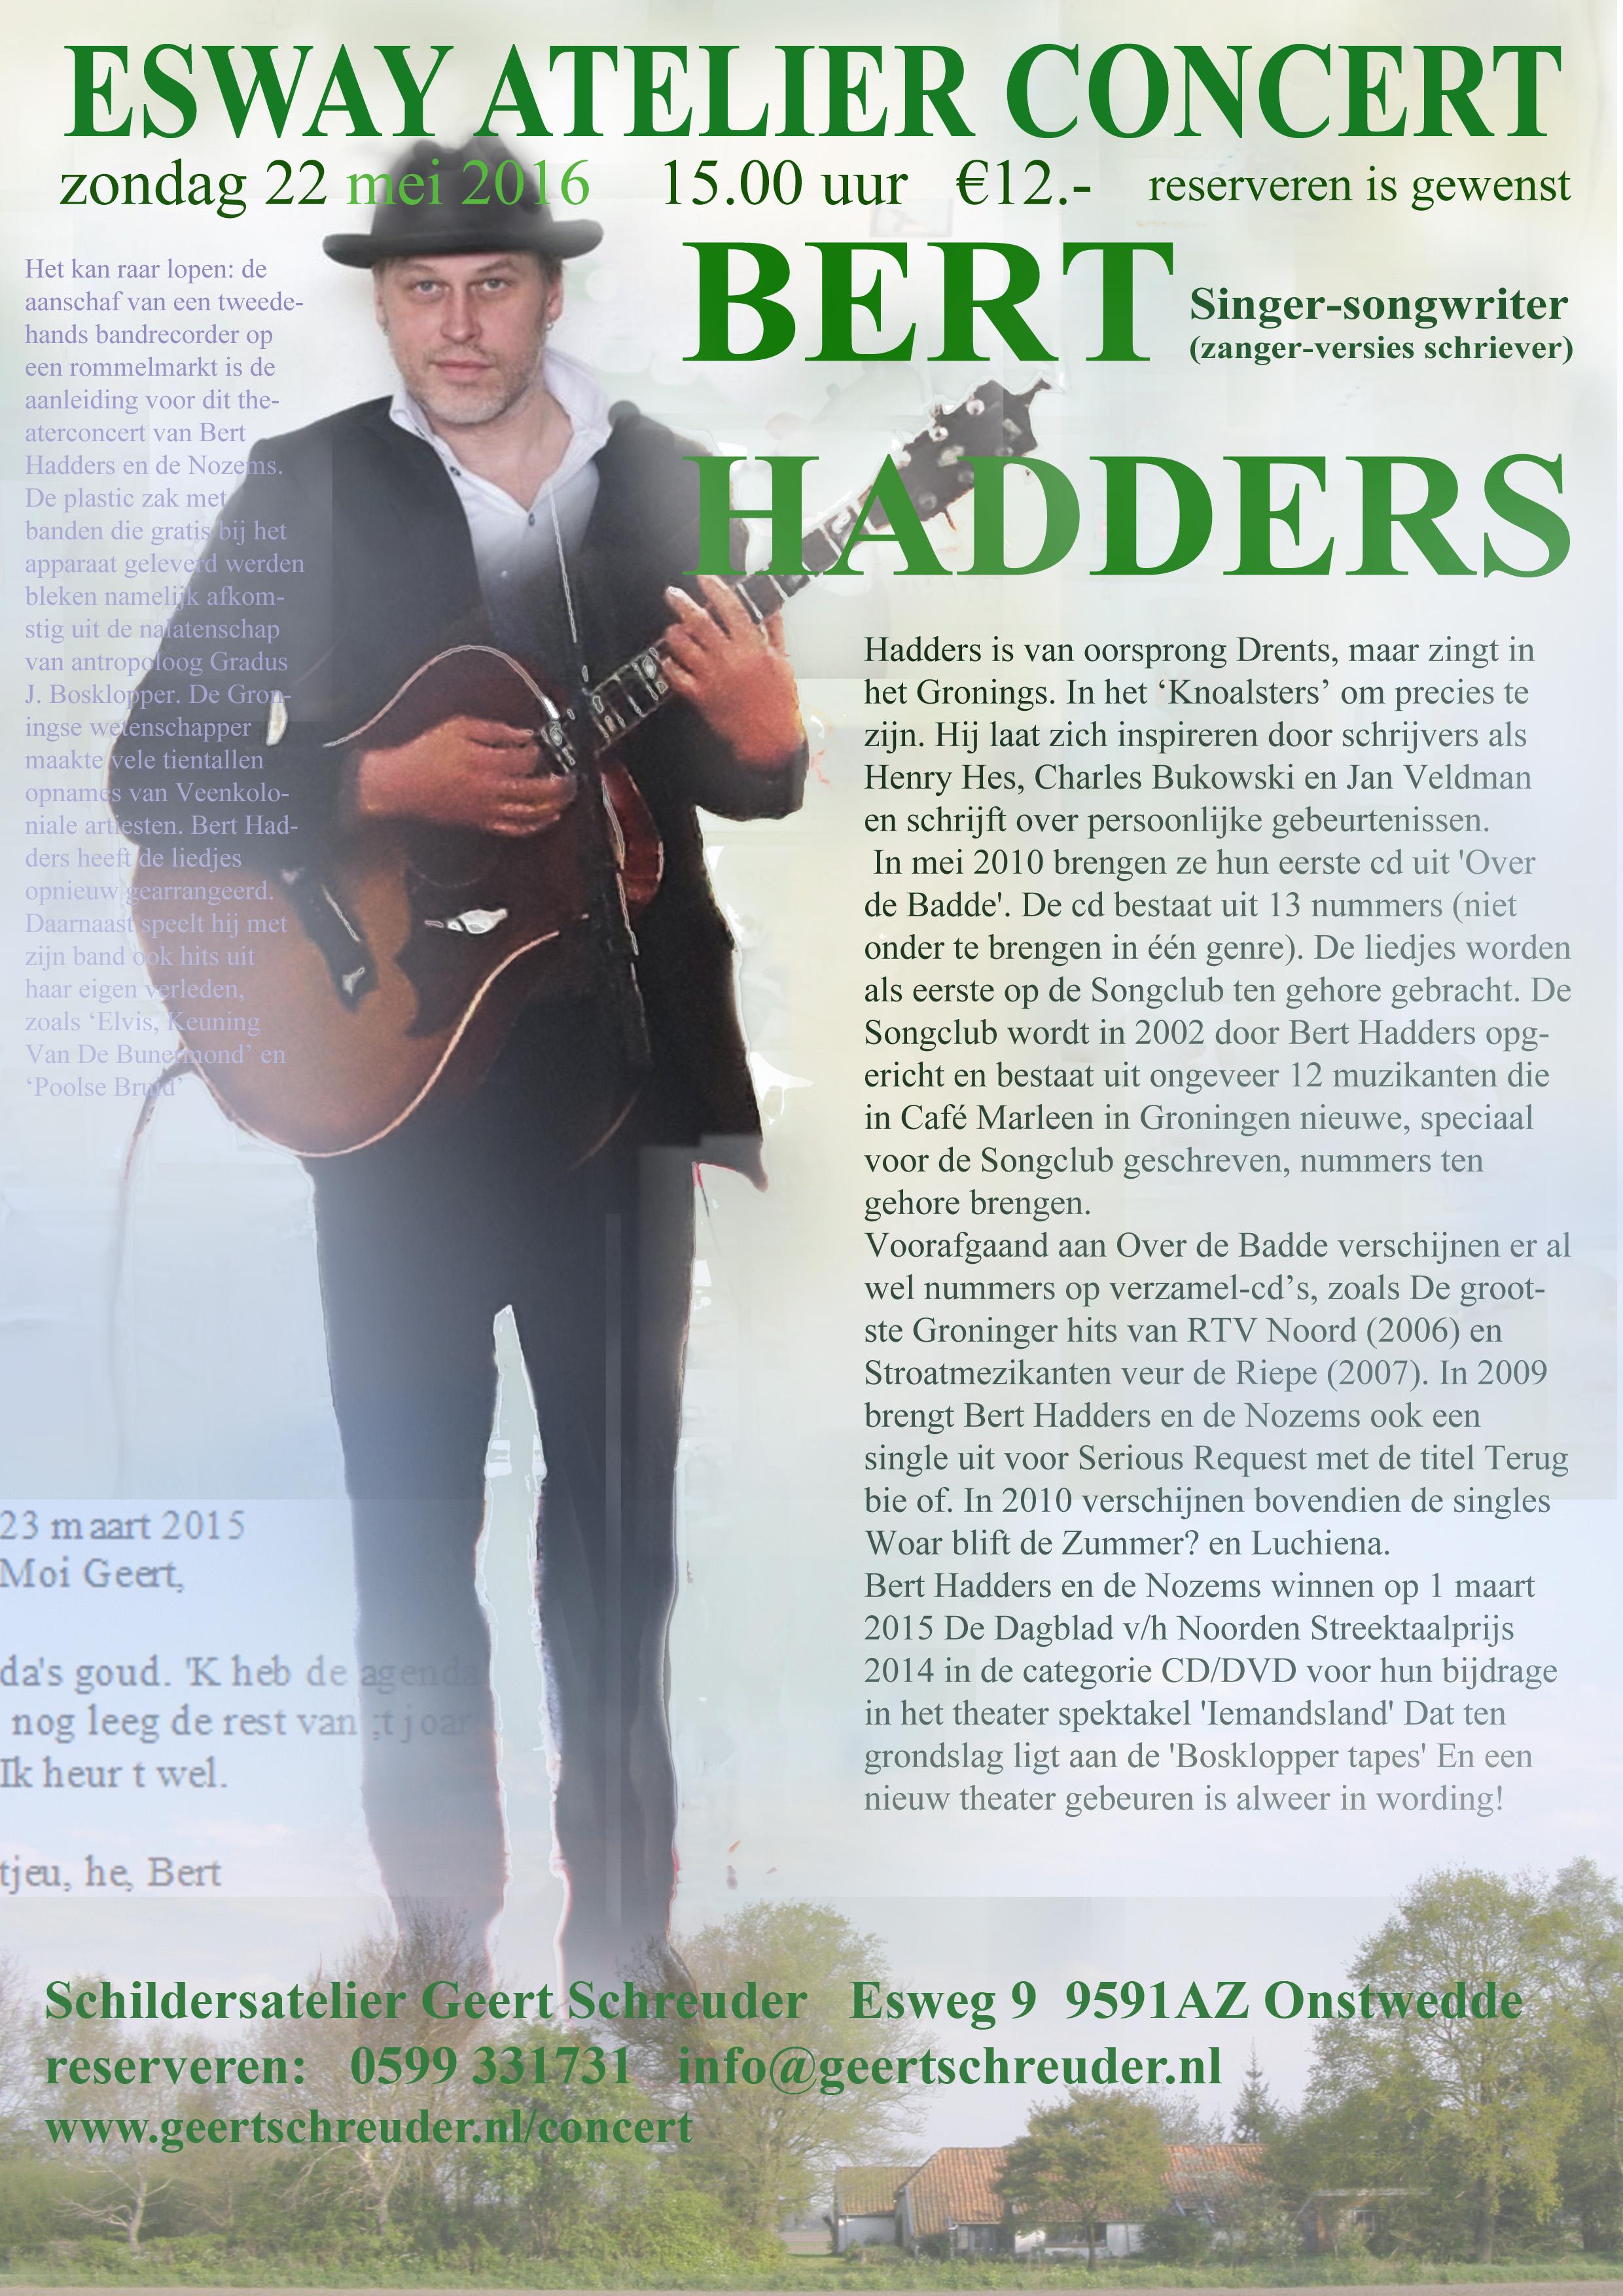 bert Hadders